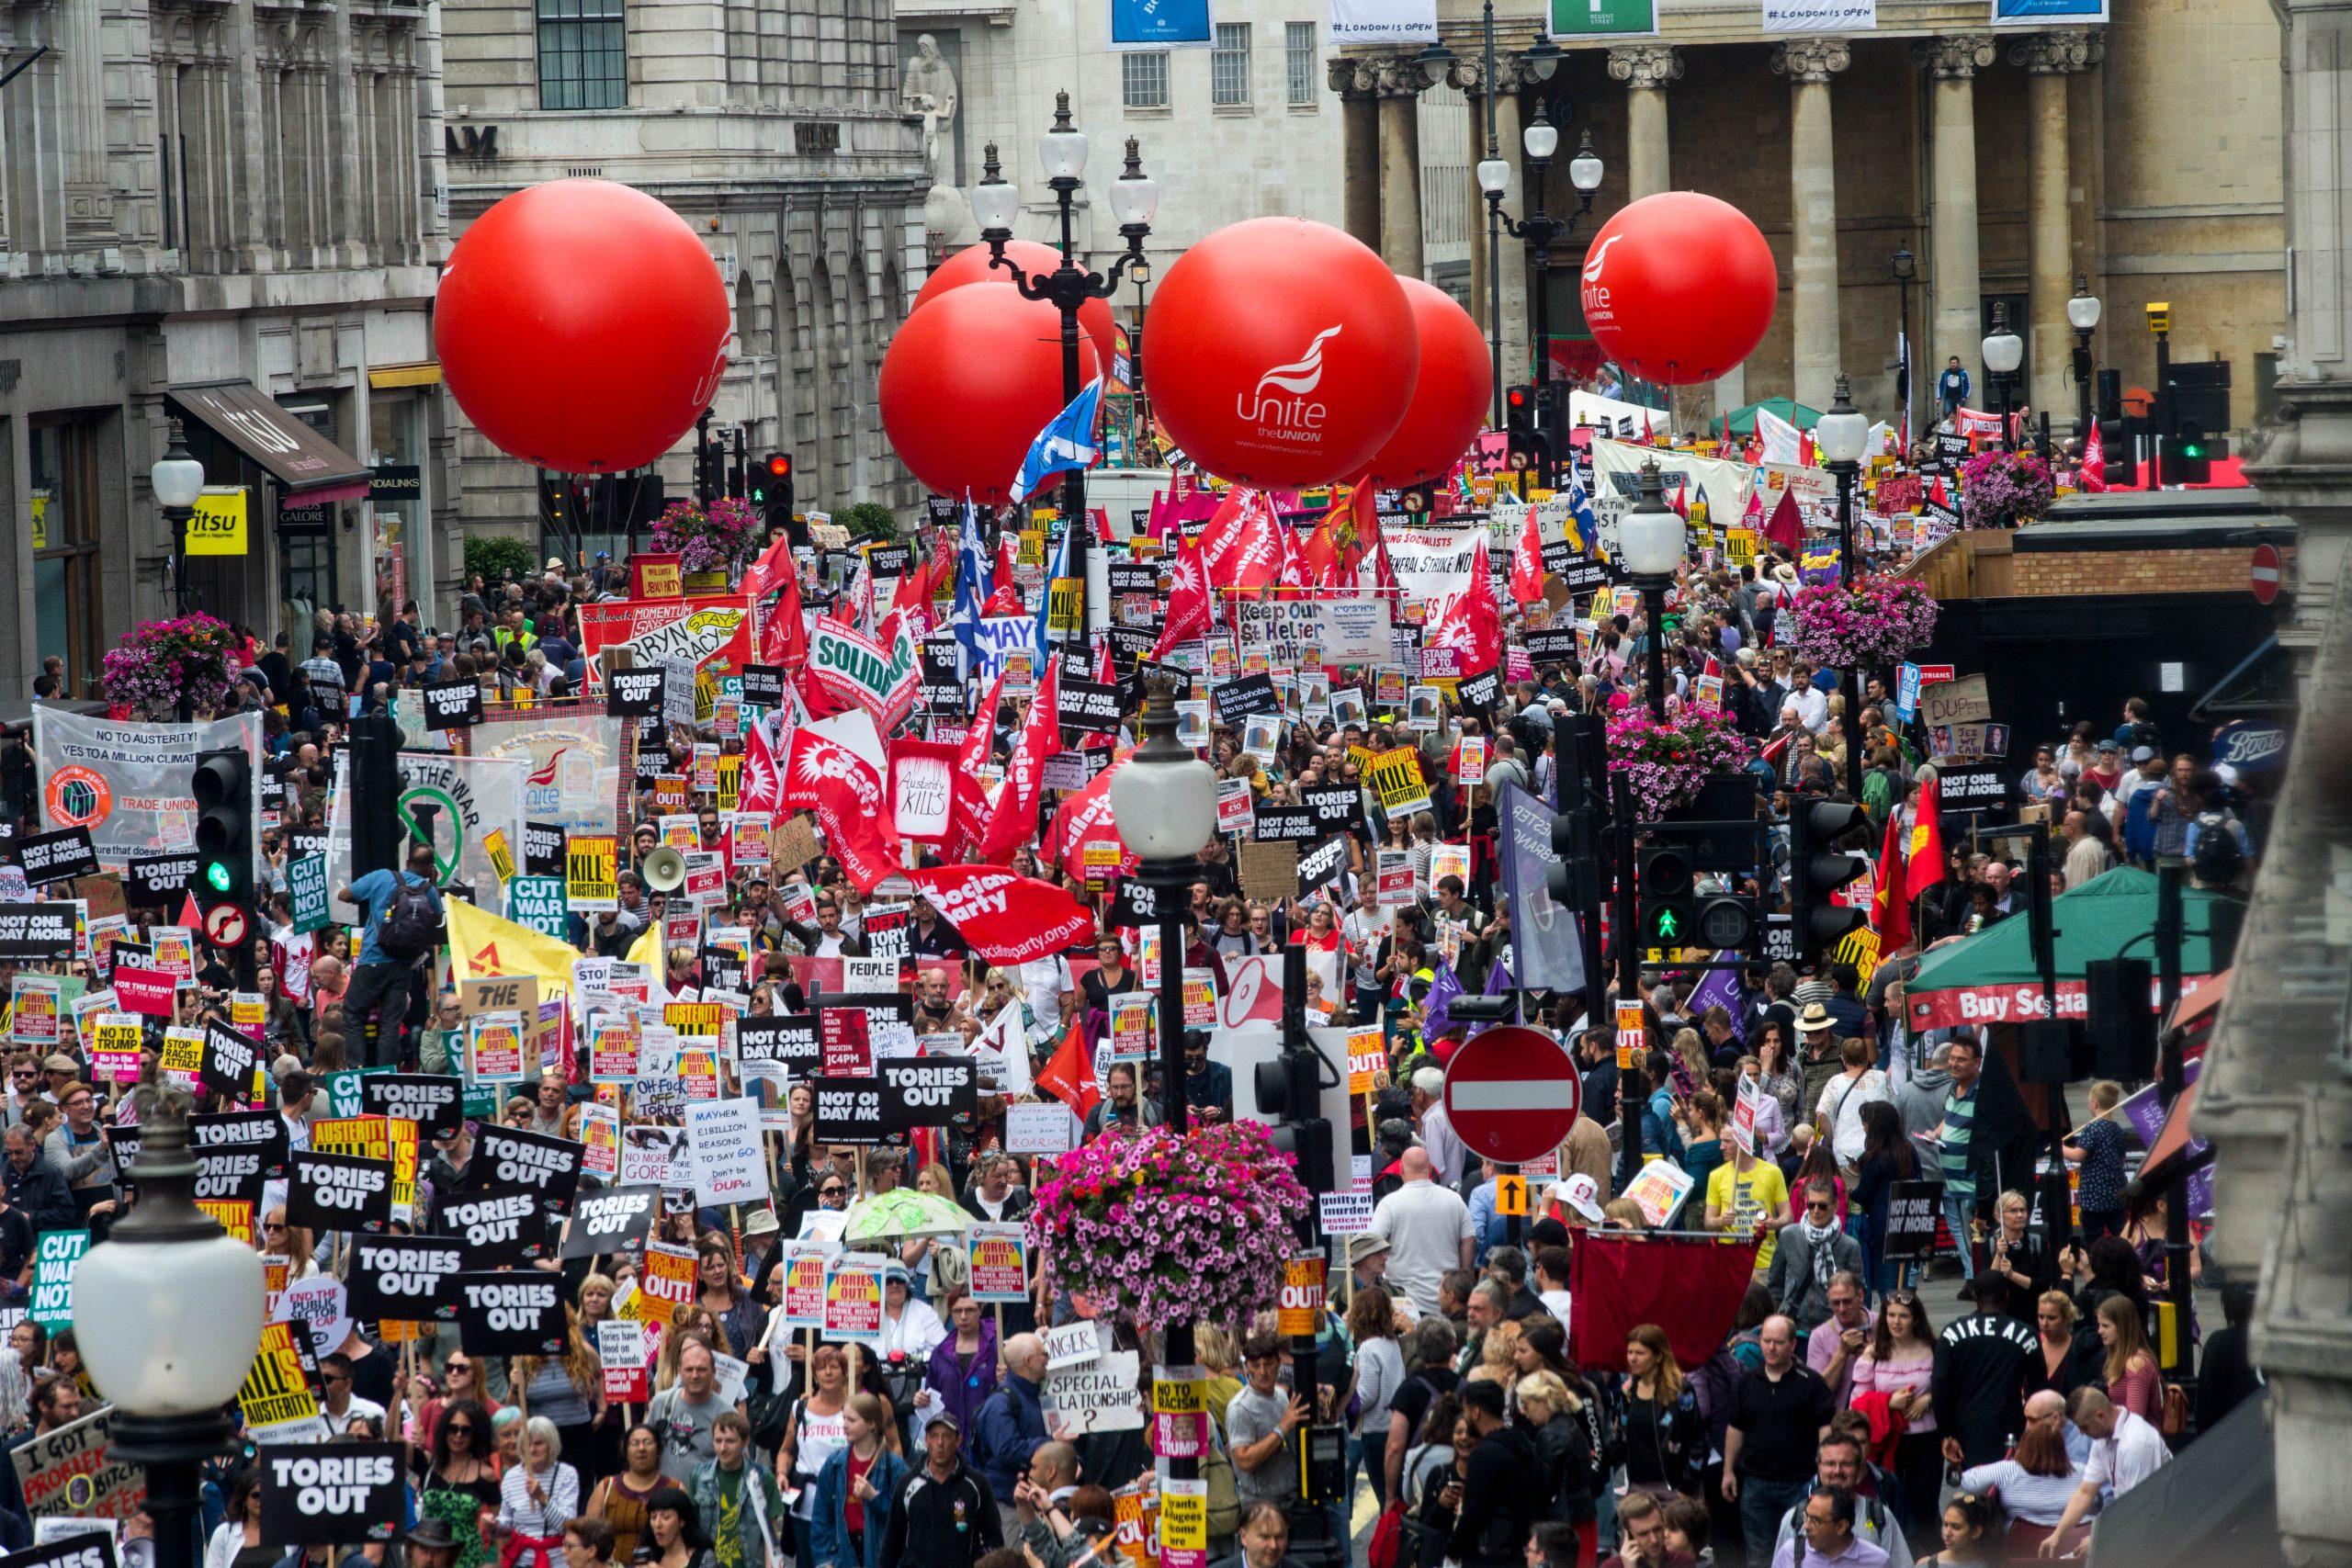 Unite on austerity march